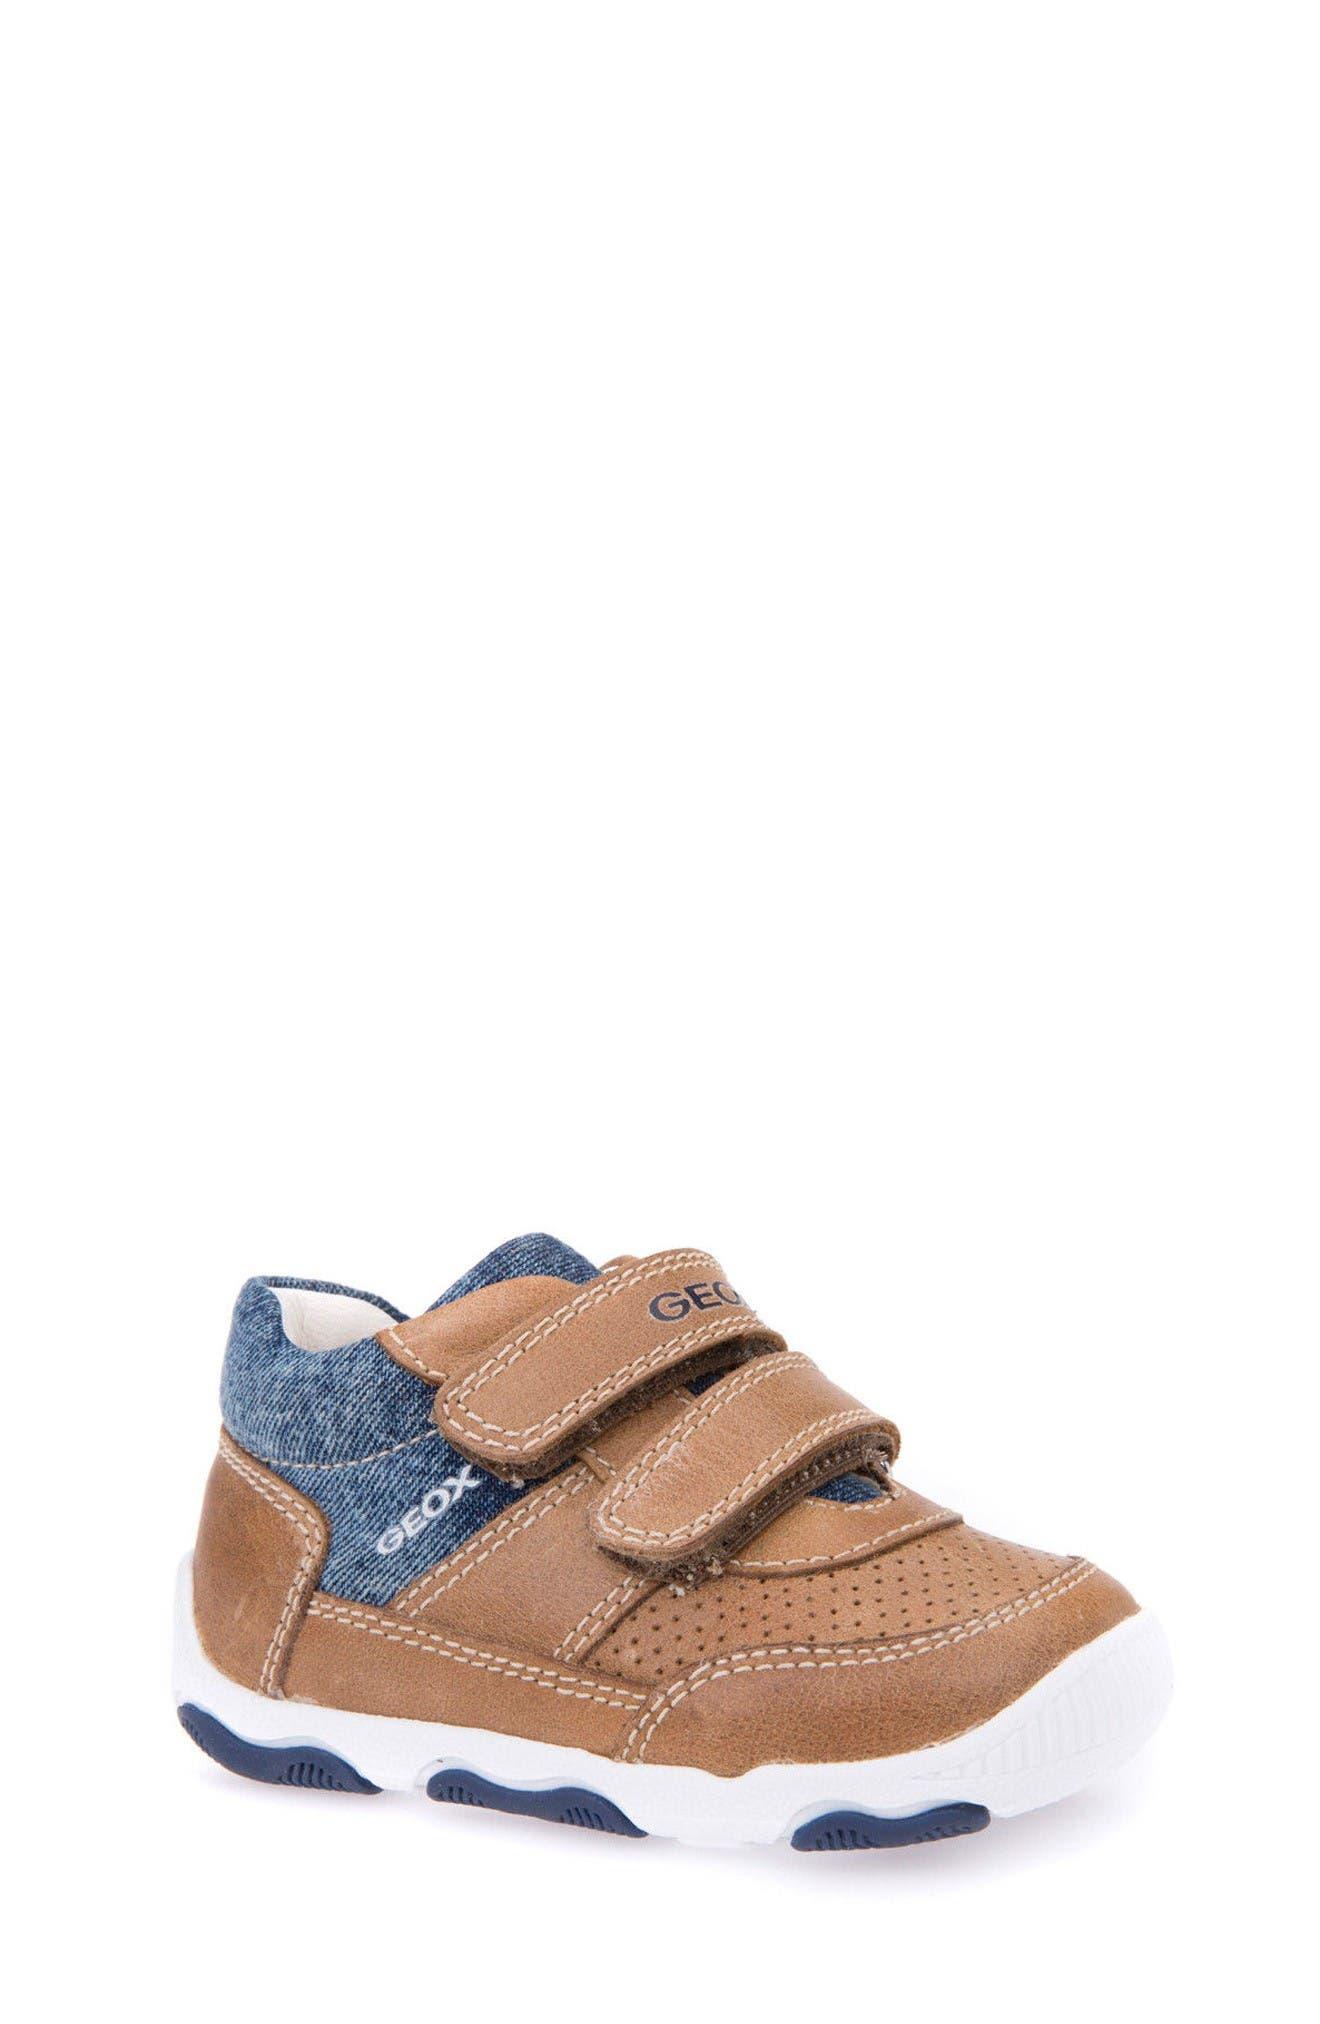 Geox'Balu' Sneaker (Baby, Walker & Toddler)